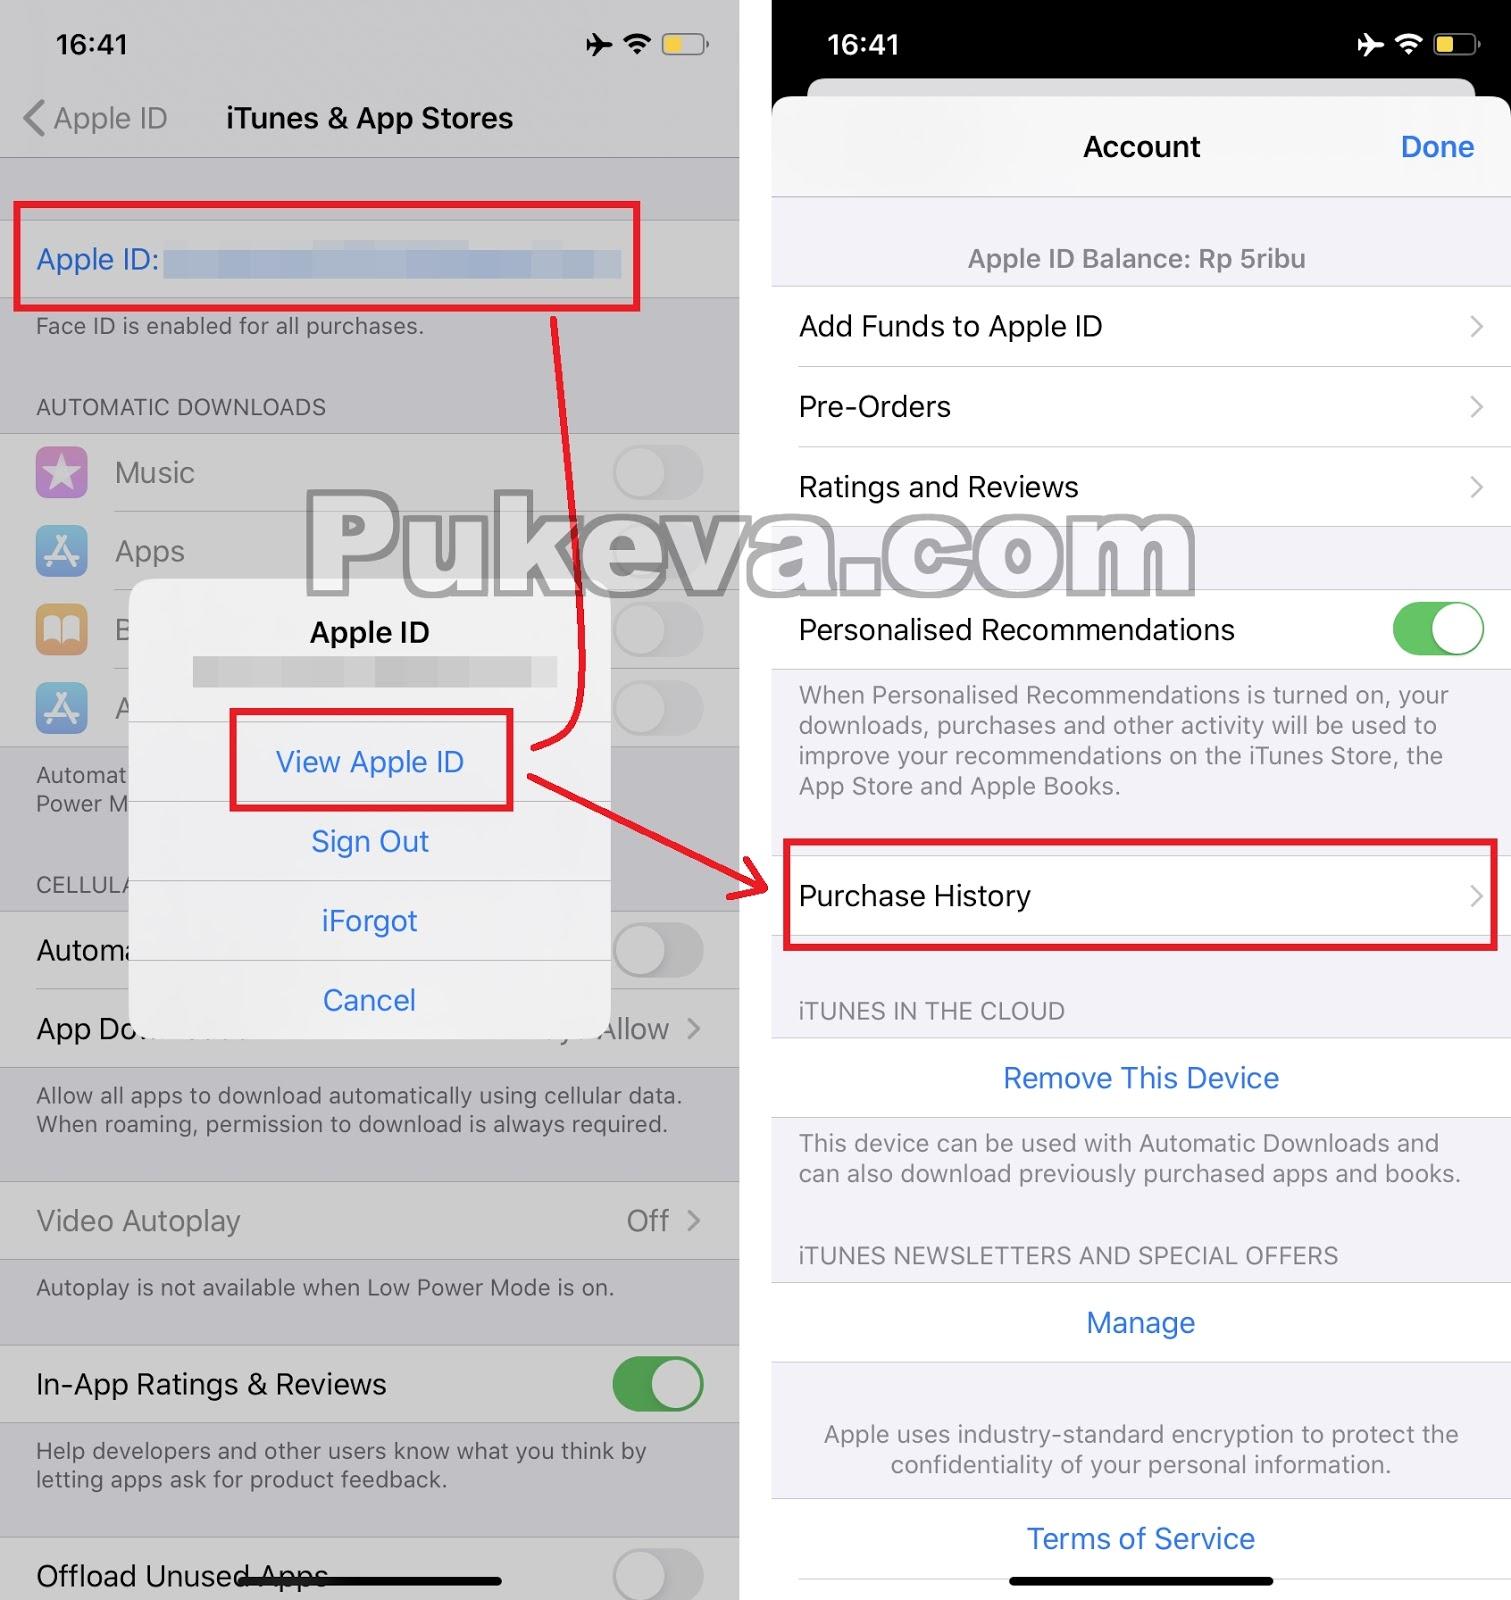 Cara Melihat Riwayat History Pembelian Di App Store Itunes Iphone Pukeva